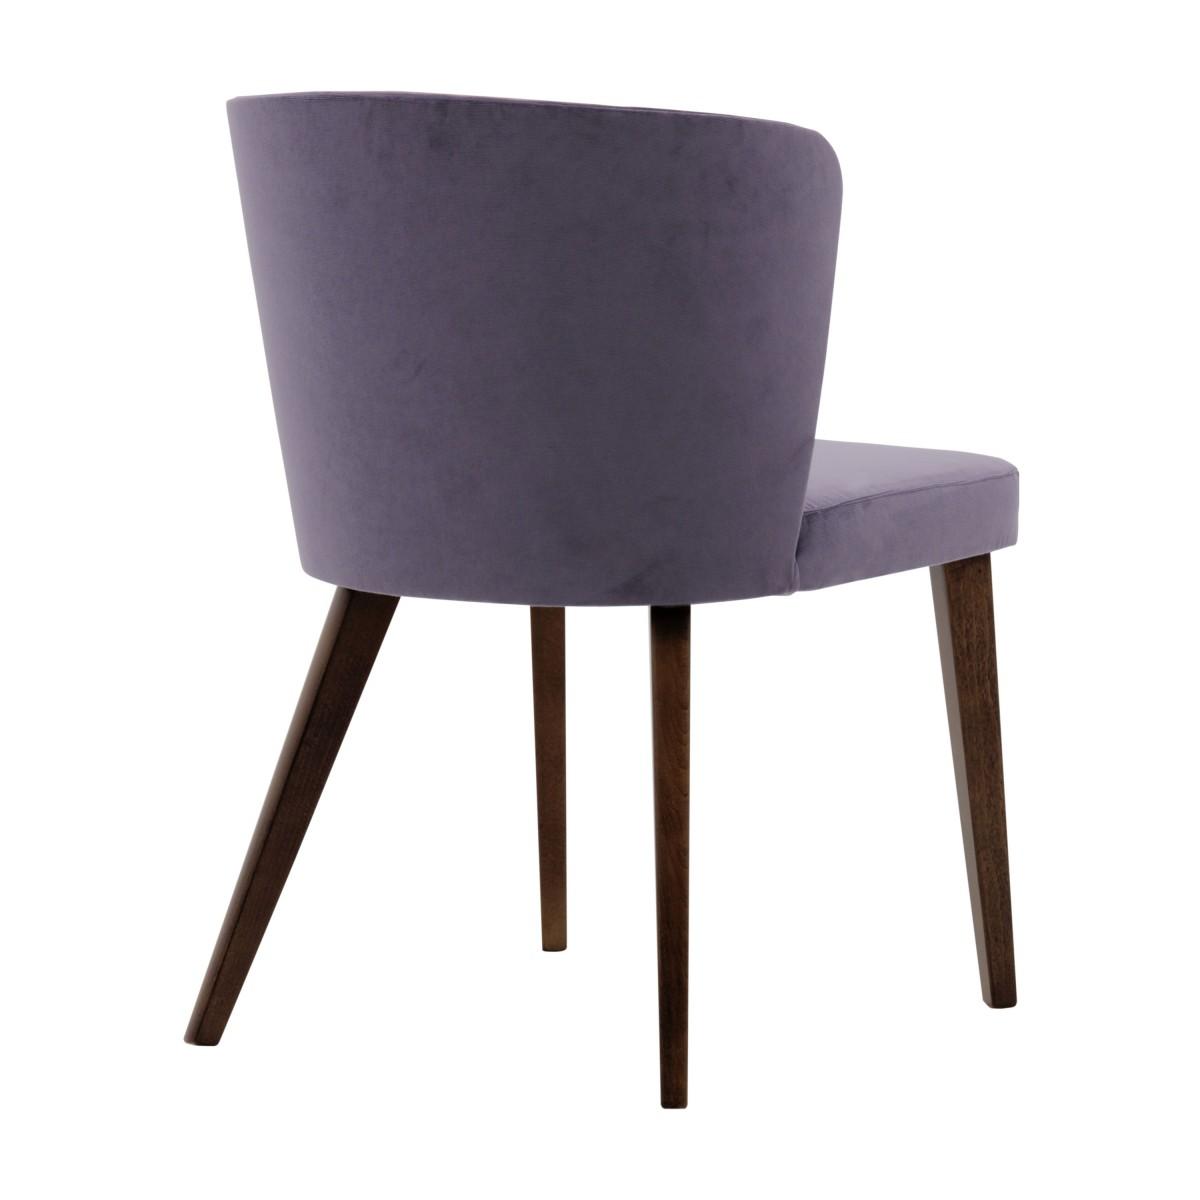 italian modern chair eva 1 7702